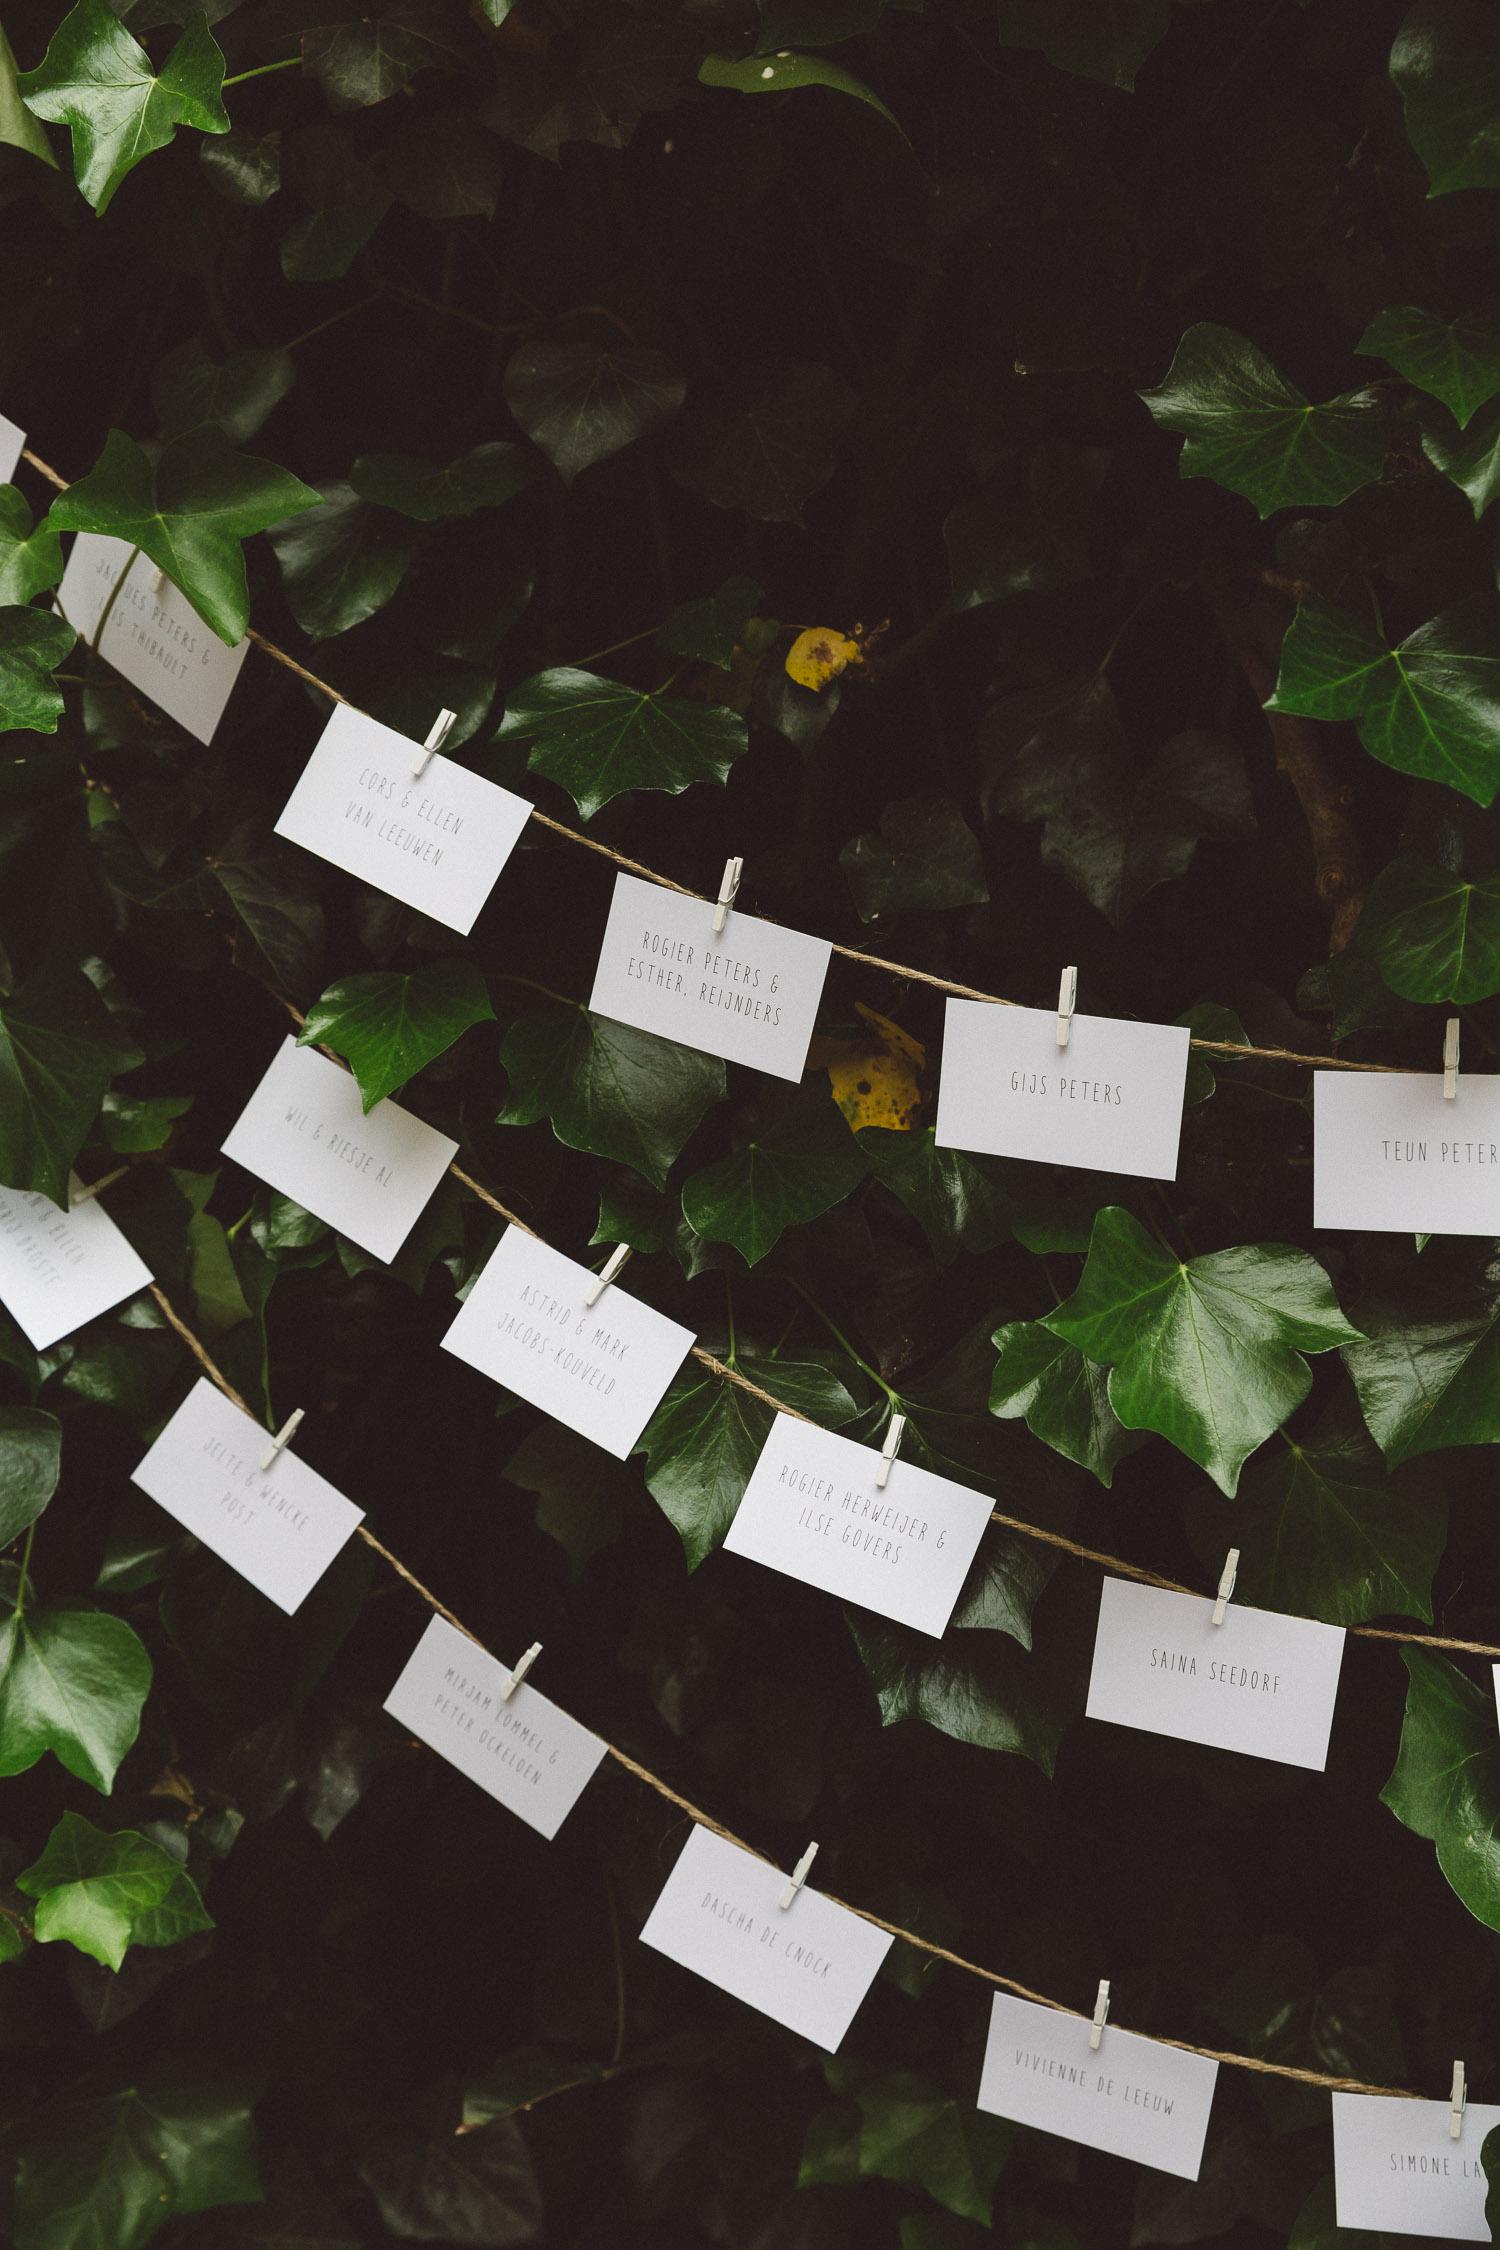 Backyard-wedding-Bruiloft-Annemiek-David-fotografie-photography-On-a-hazy-morning-Amsterdam-The-Netherlands408.jpg